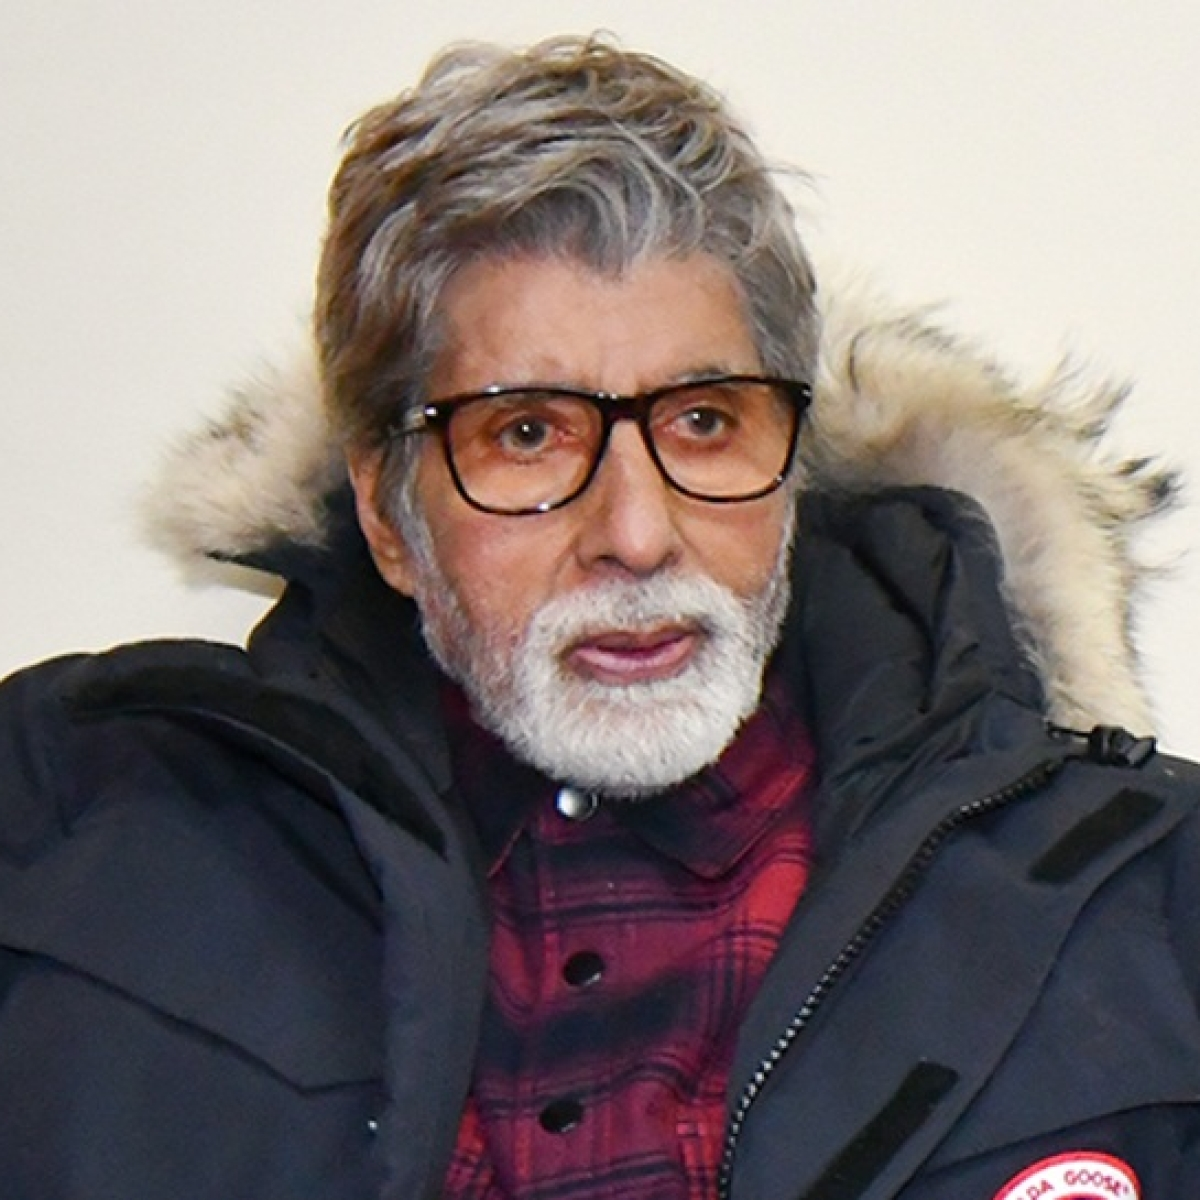 Amitabh Bachchan ecstatic as son Abhishek gets disharged: 'Welcome home Bhaiyu'